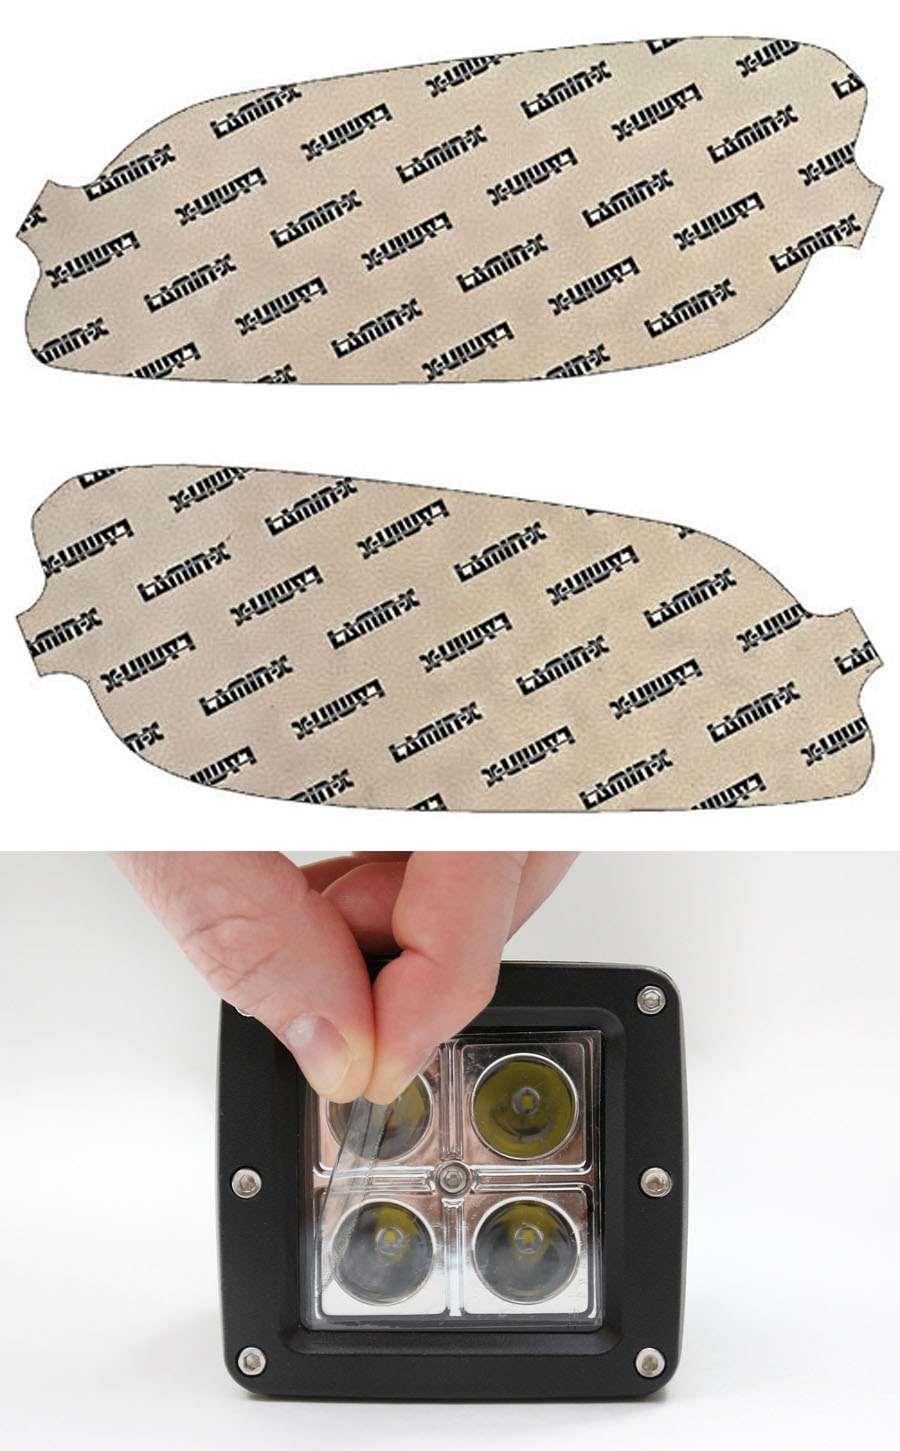 Kia Optima 14-15 Clear Fog Light Covers Lamin-X K127CL